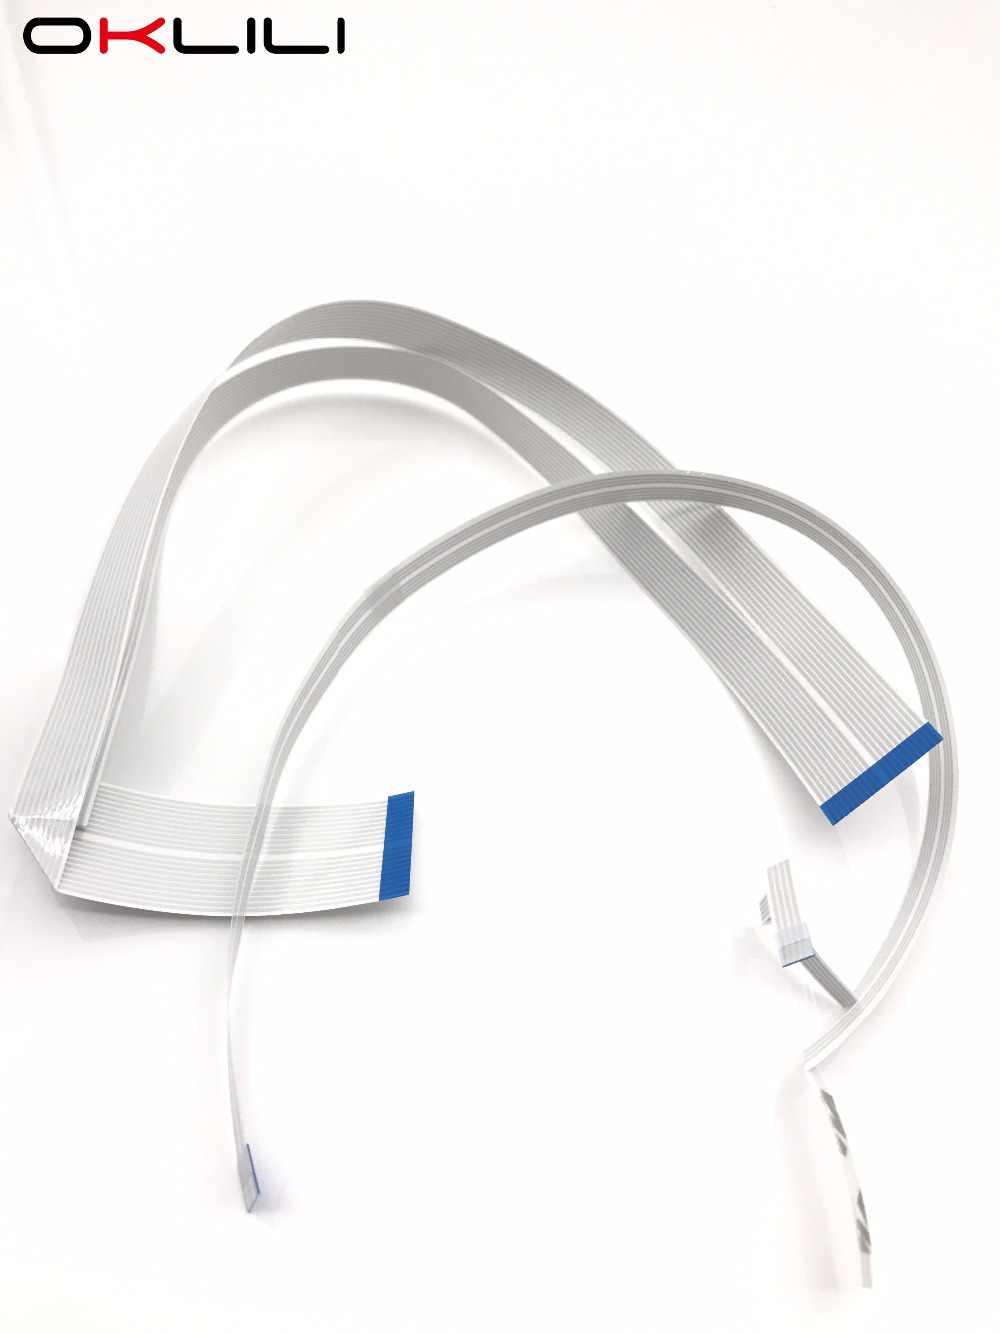 Cetak Kepala Kabel Carriage Kabel Sensor untuk Epson L351 L353 L355 L358 L362 L365 L366 L381 L455 L456 L550 L551 l555 L558 L565 L566